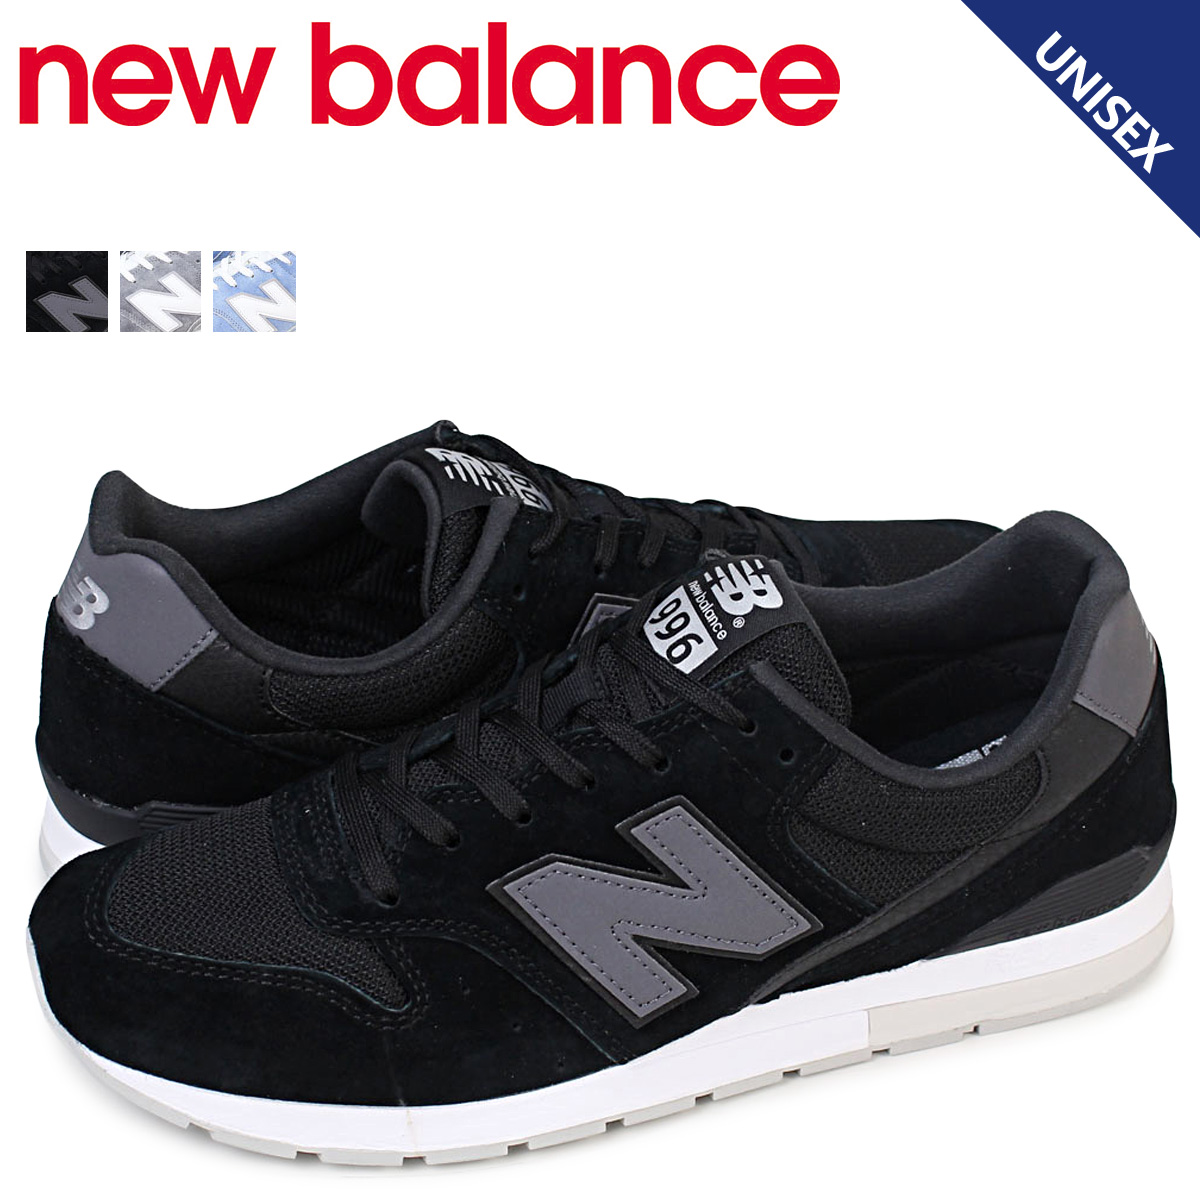 nb online shop